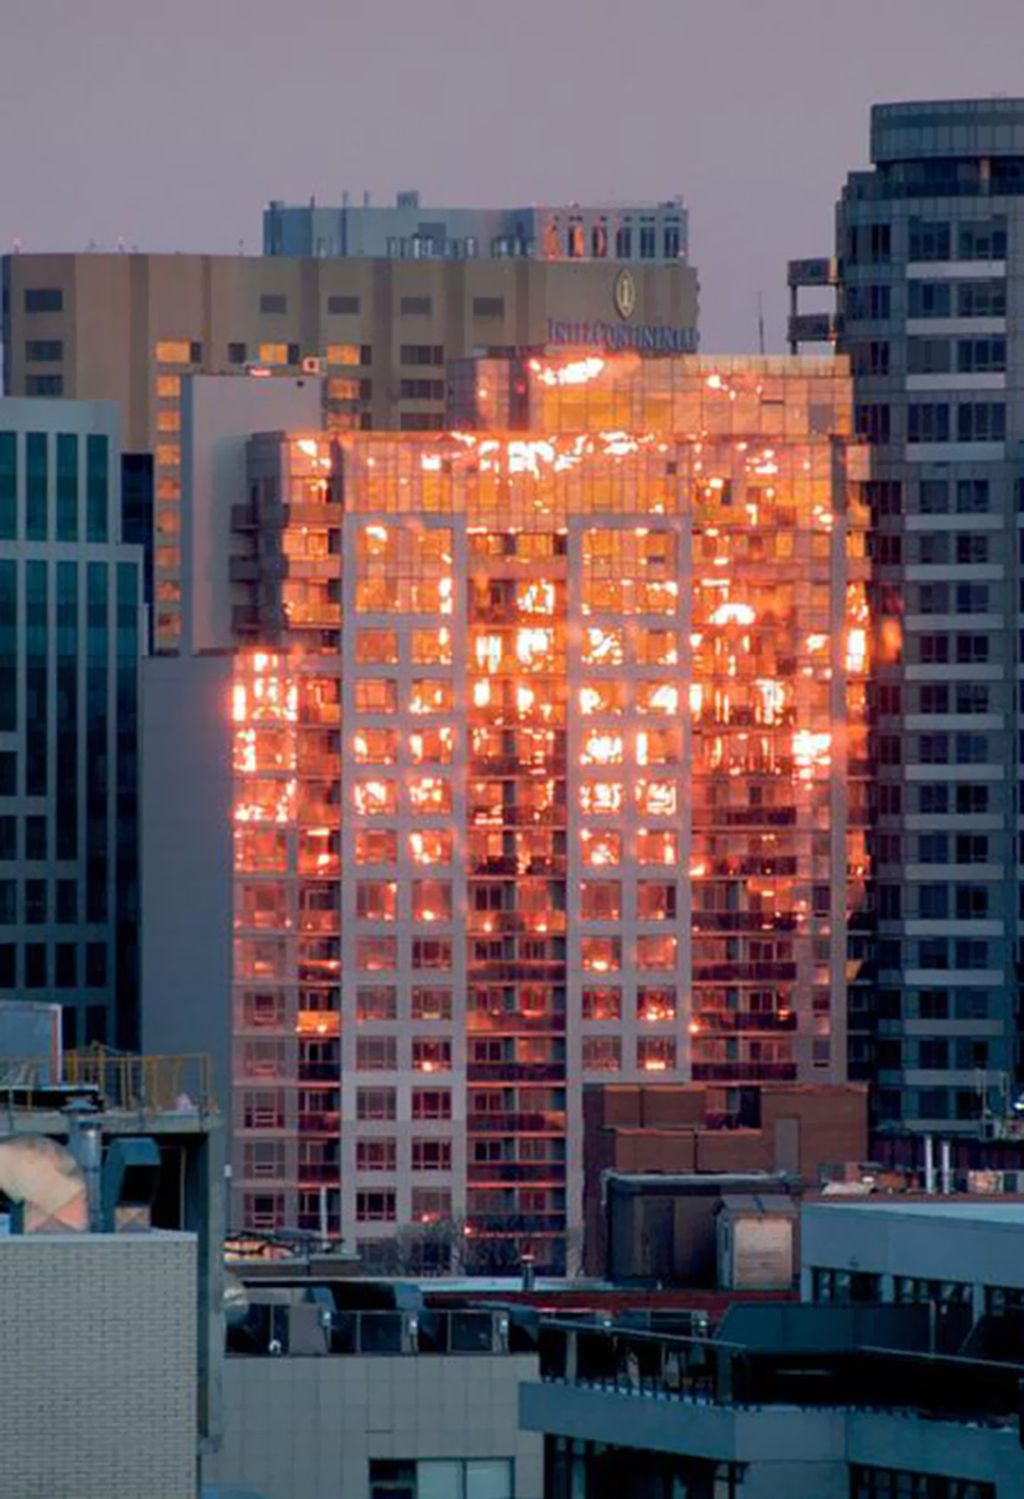 Ini bukan gedung yang terbakar, tapi momen saat matahari terbenam yang memantul di kaca gedung. (Foto: boredpanda)